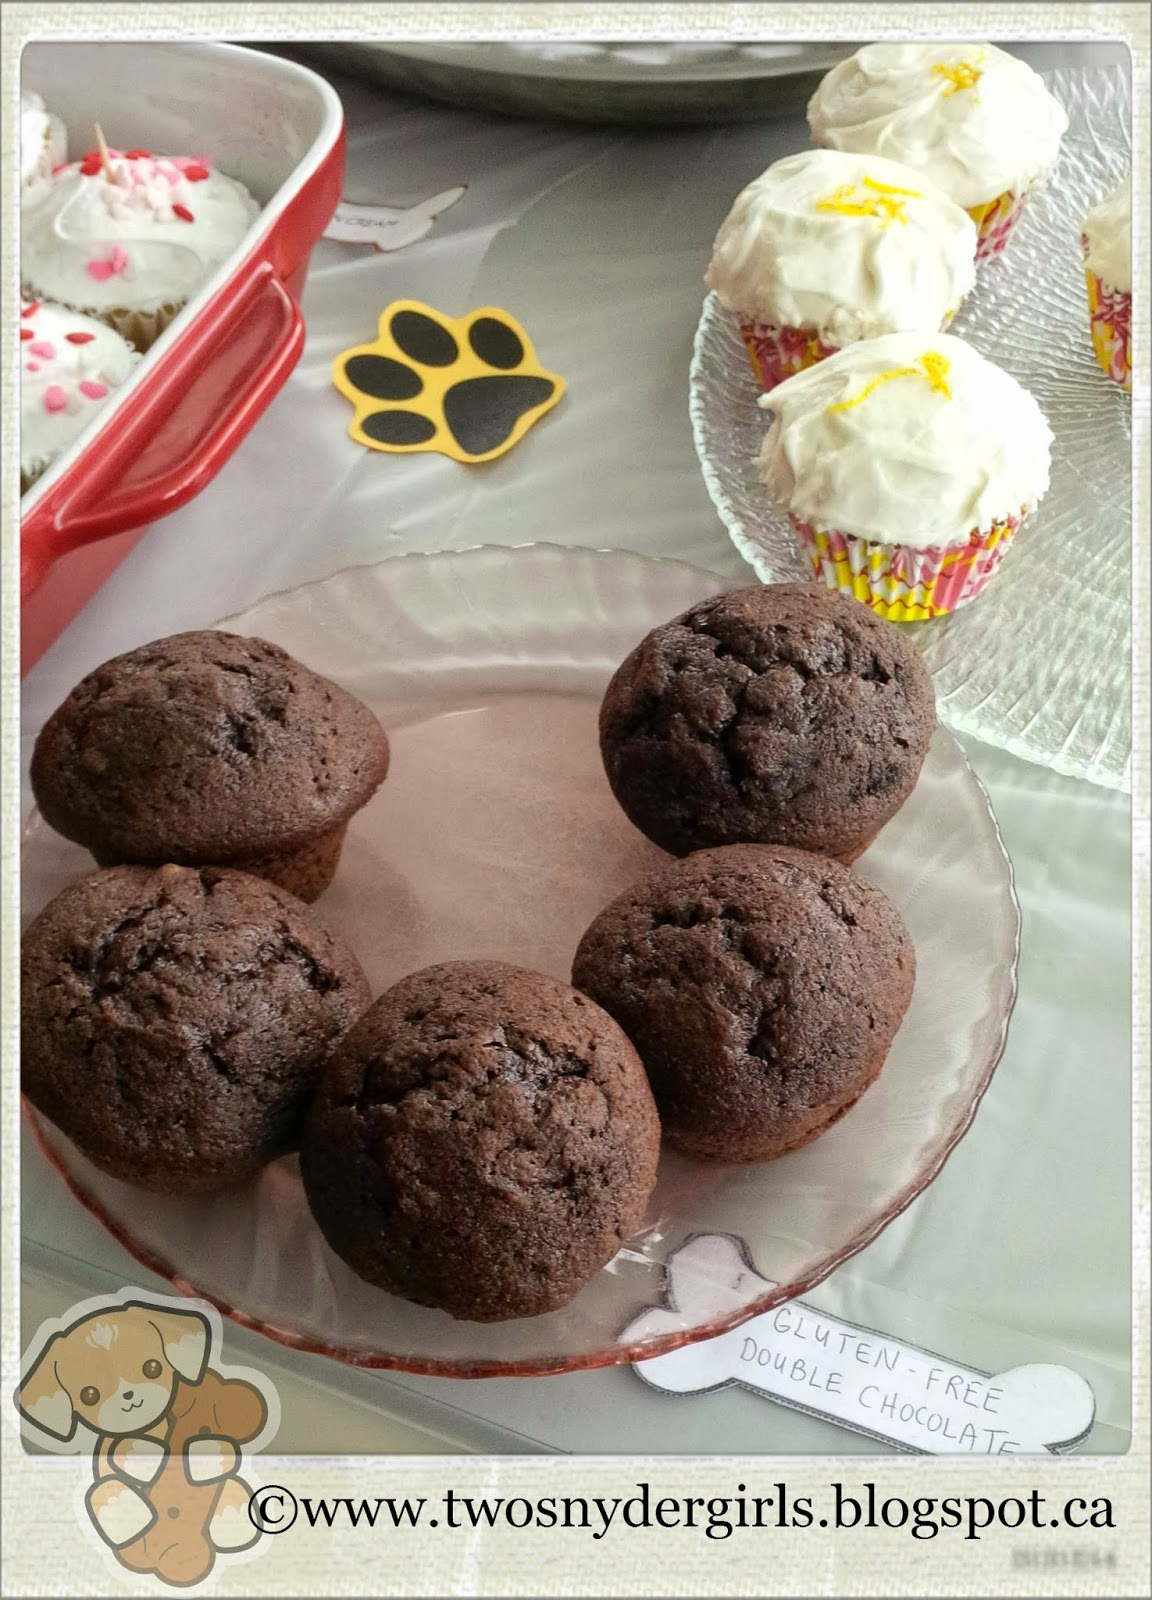 Gluten free double chocolate cupcakes